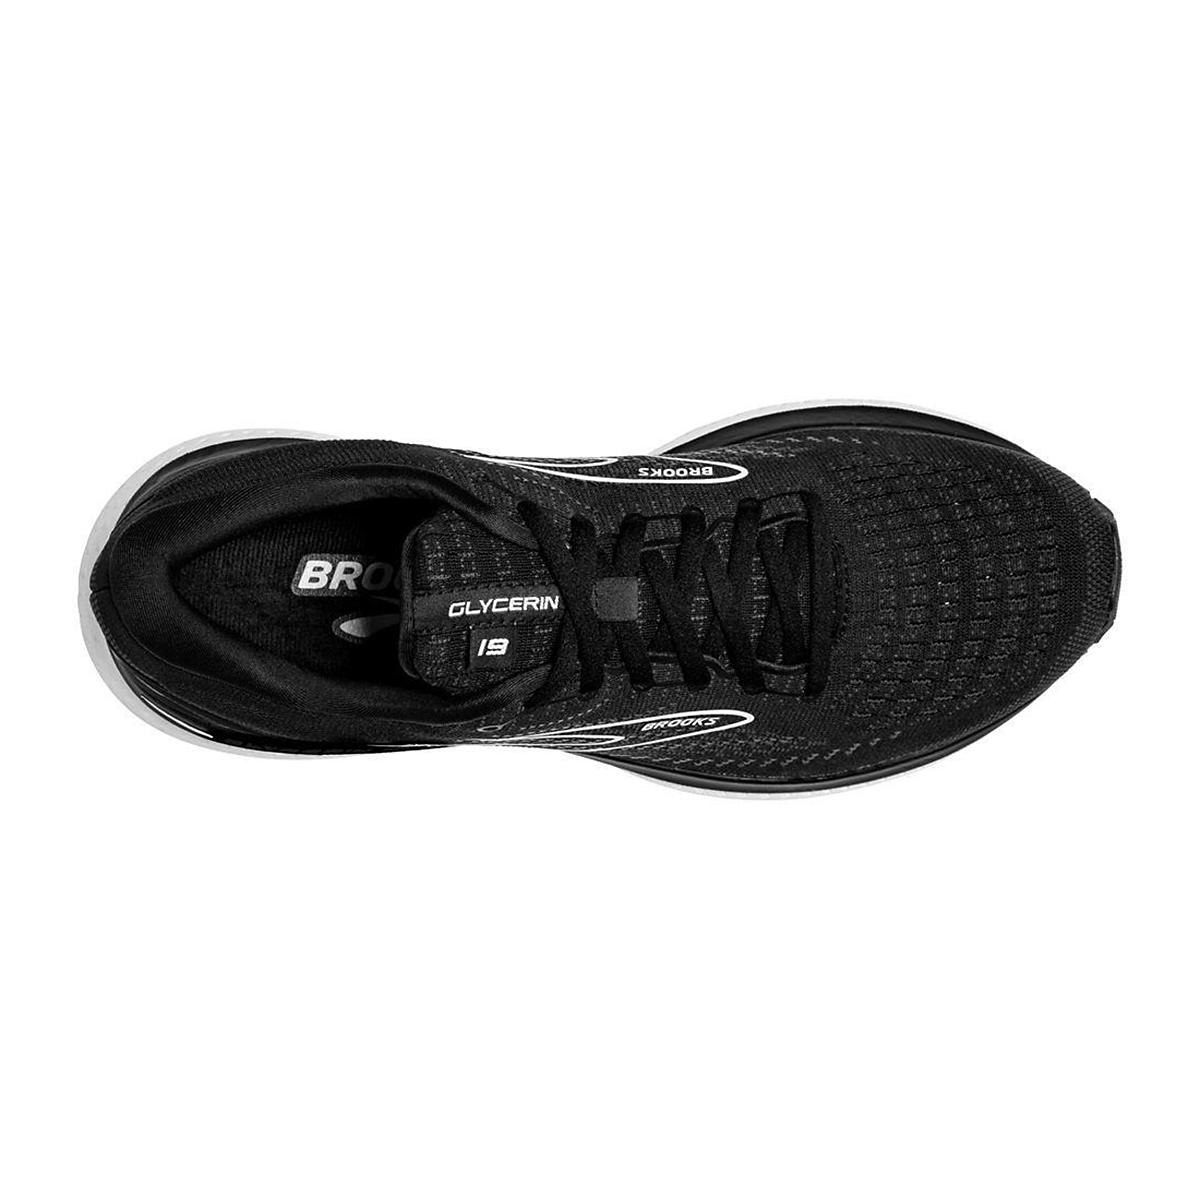 Women's Brooks Glycerin 19 Running Shoe - Color: Black/White - Size: 5 - Width: Regular, Black/White, large, image 5